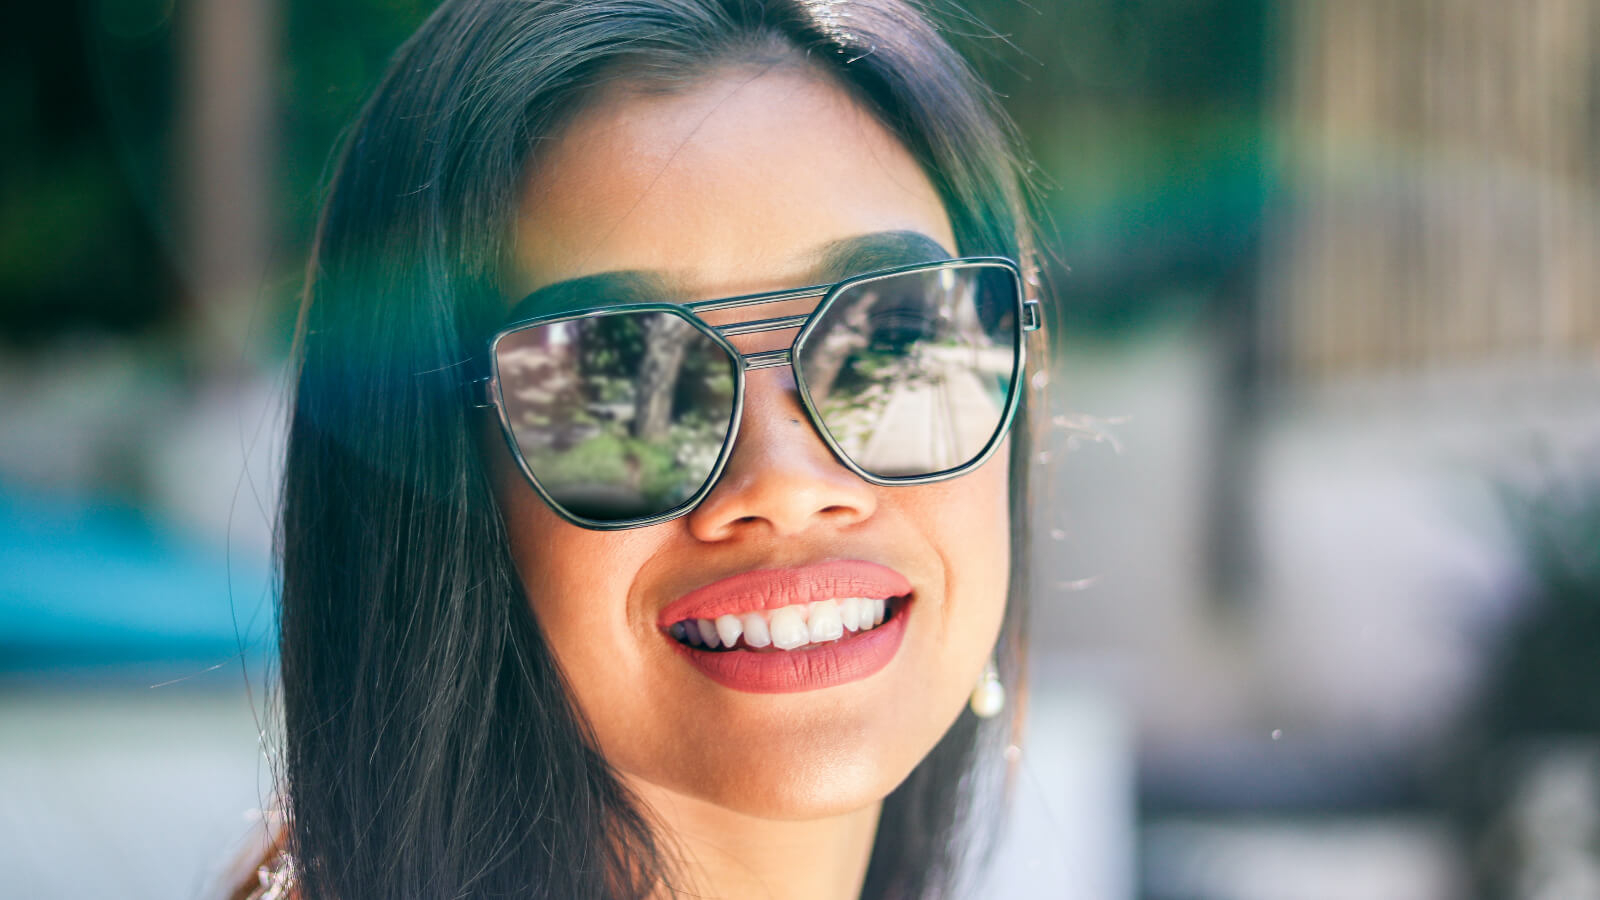 Mirror coated lenses